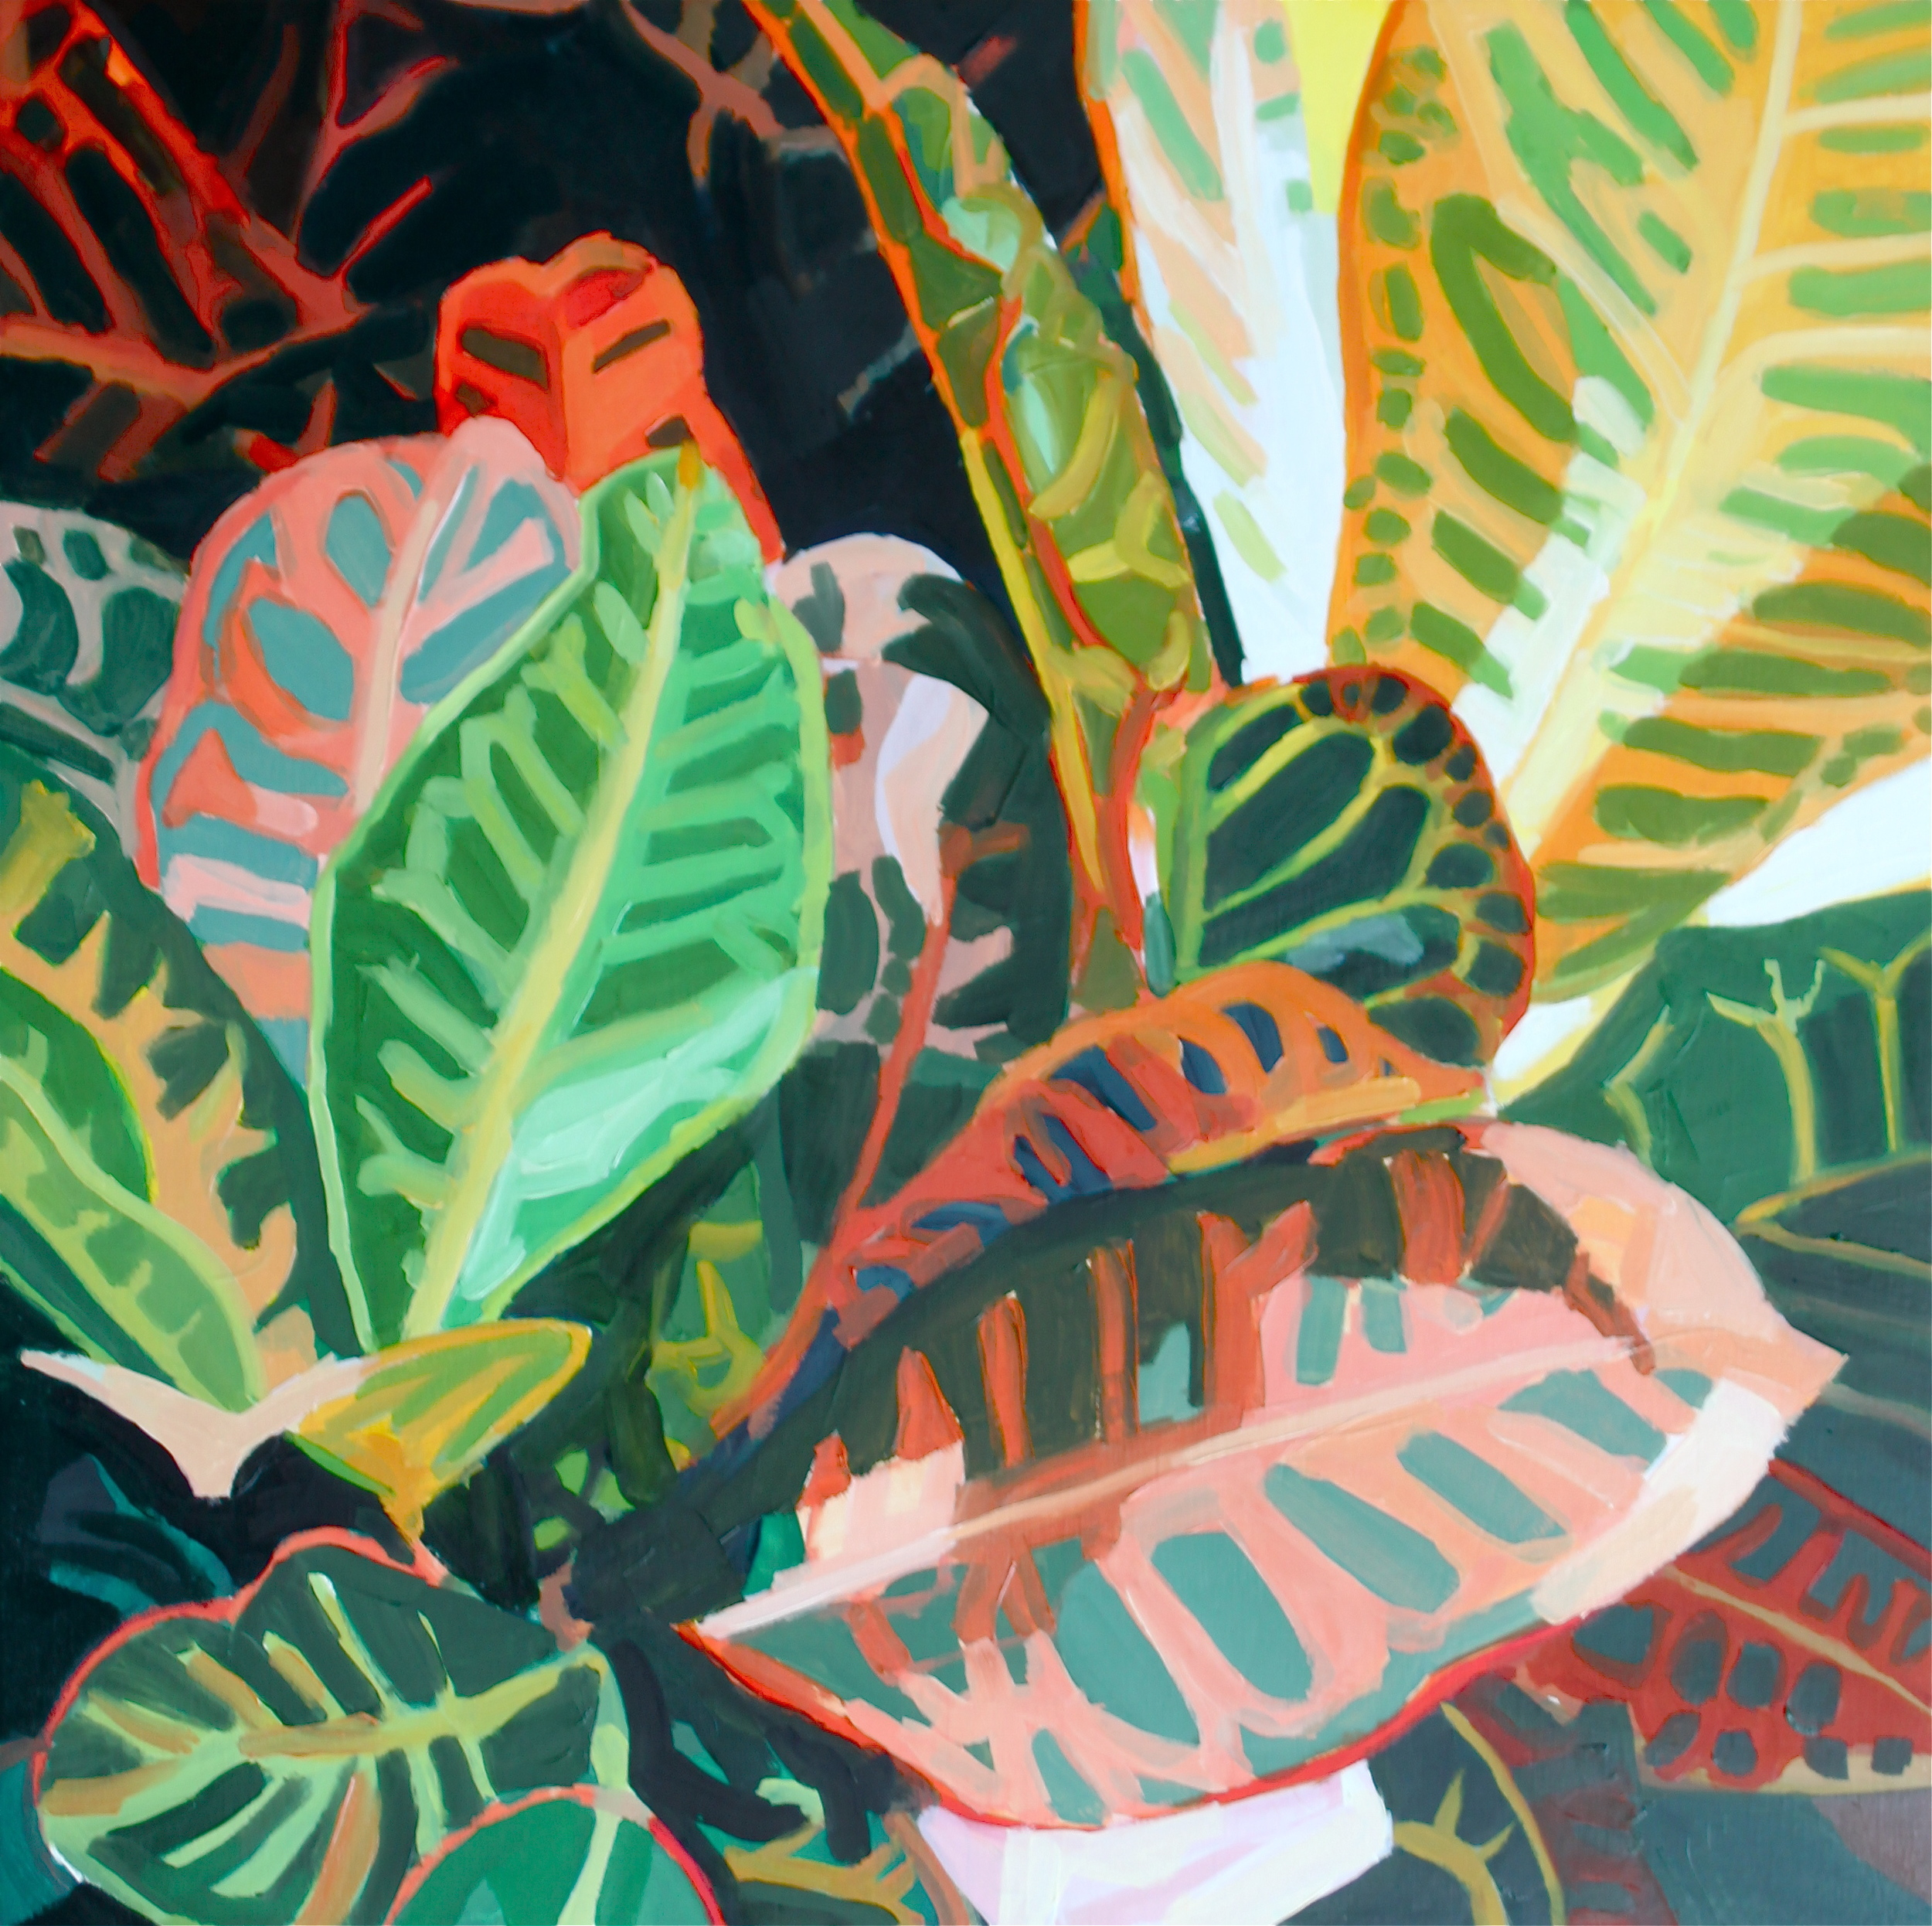 Erin Fitzpatrick, Plant Study 1